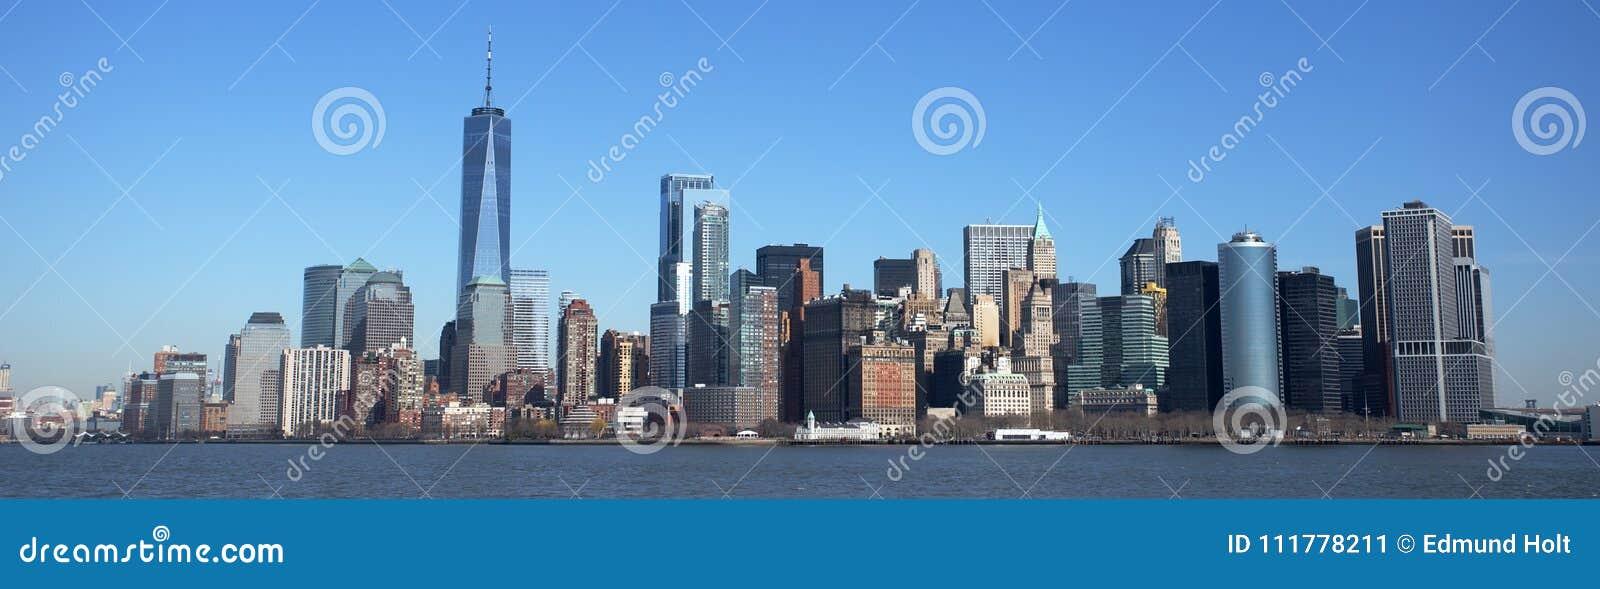 Manhattan Skyline and One World Trade Centre